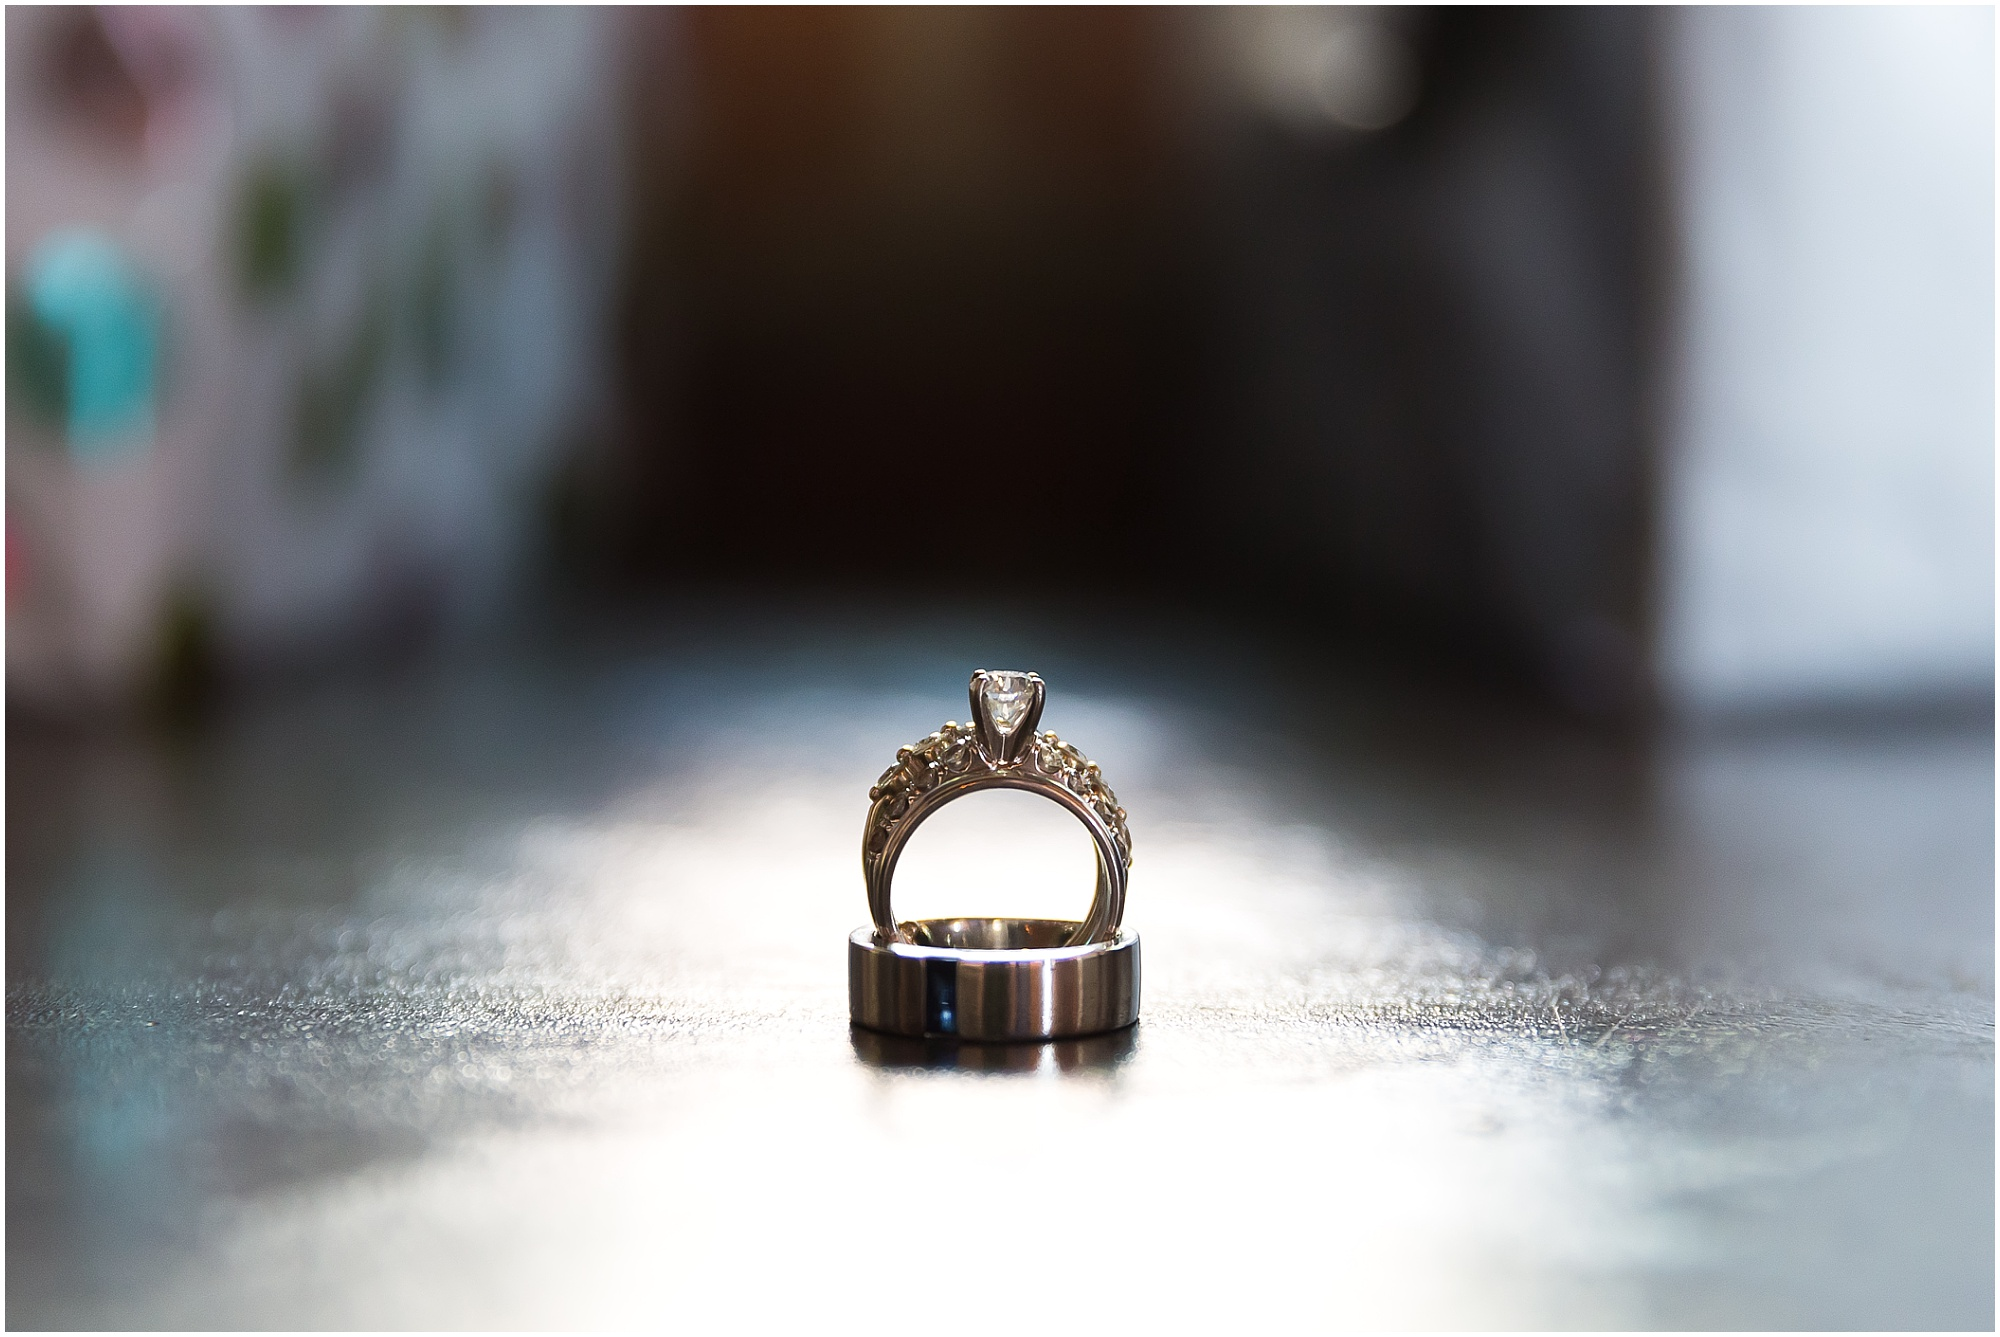 Wedding rings from downtown warehouse wedding in Waco, Texas - www.jasonandmelaina.com